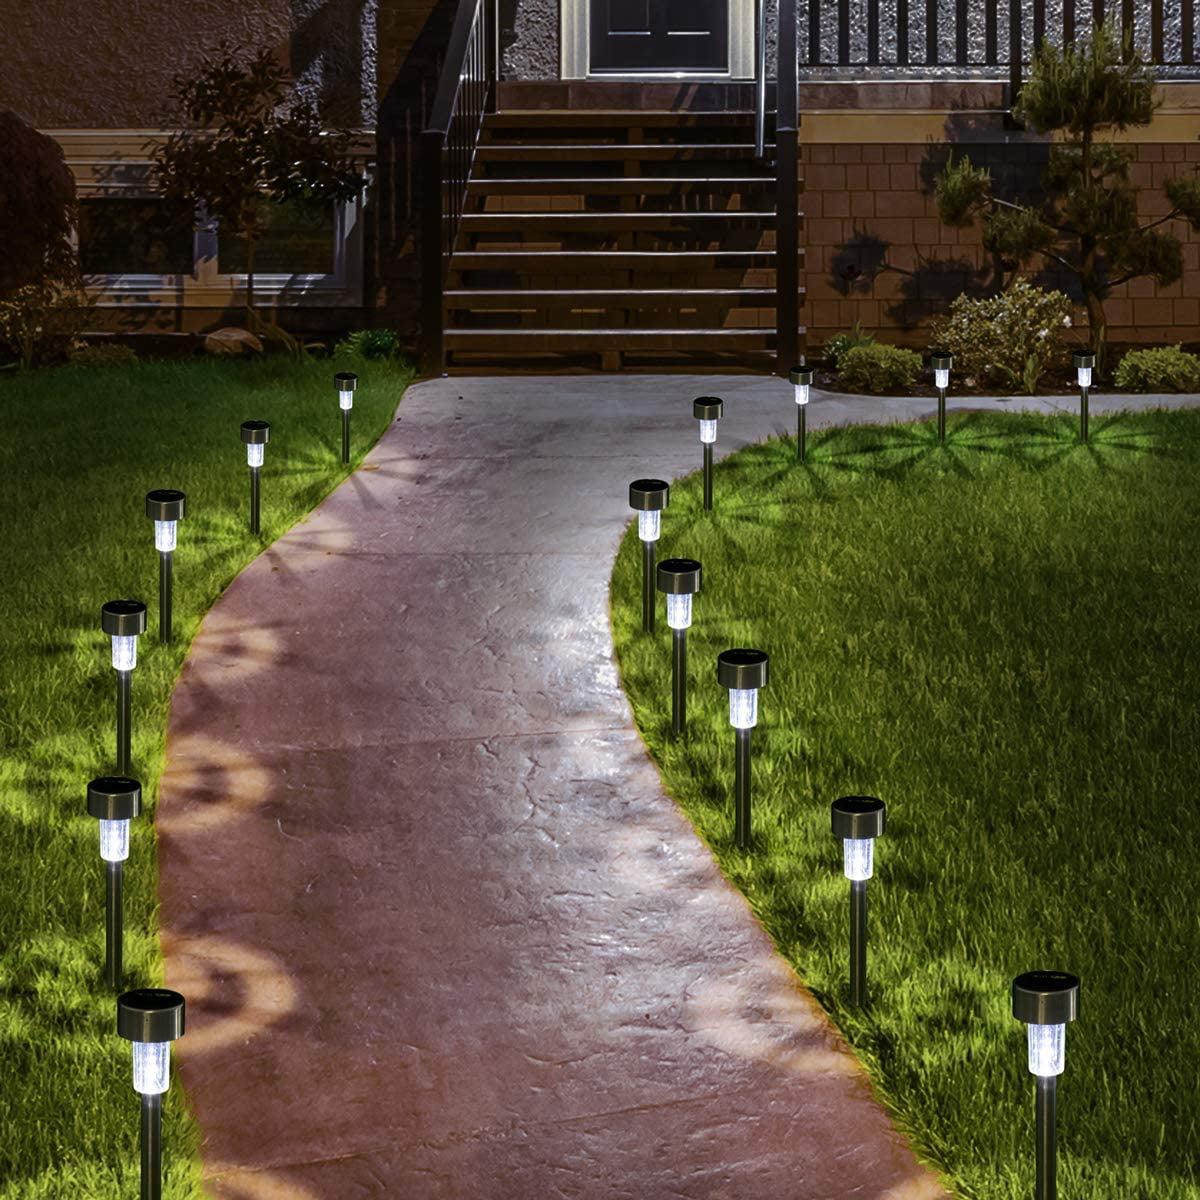 Stainless Steel Outdoor Solar Lights 12Pack Solar Lights Outdoor LED Solar Powered Landscape Lighting for Yard Patio Walkway Landscape In-Ground Spike Pathway Solar Garden Lights Waterproof